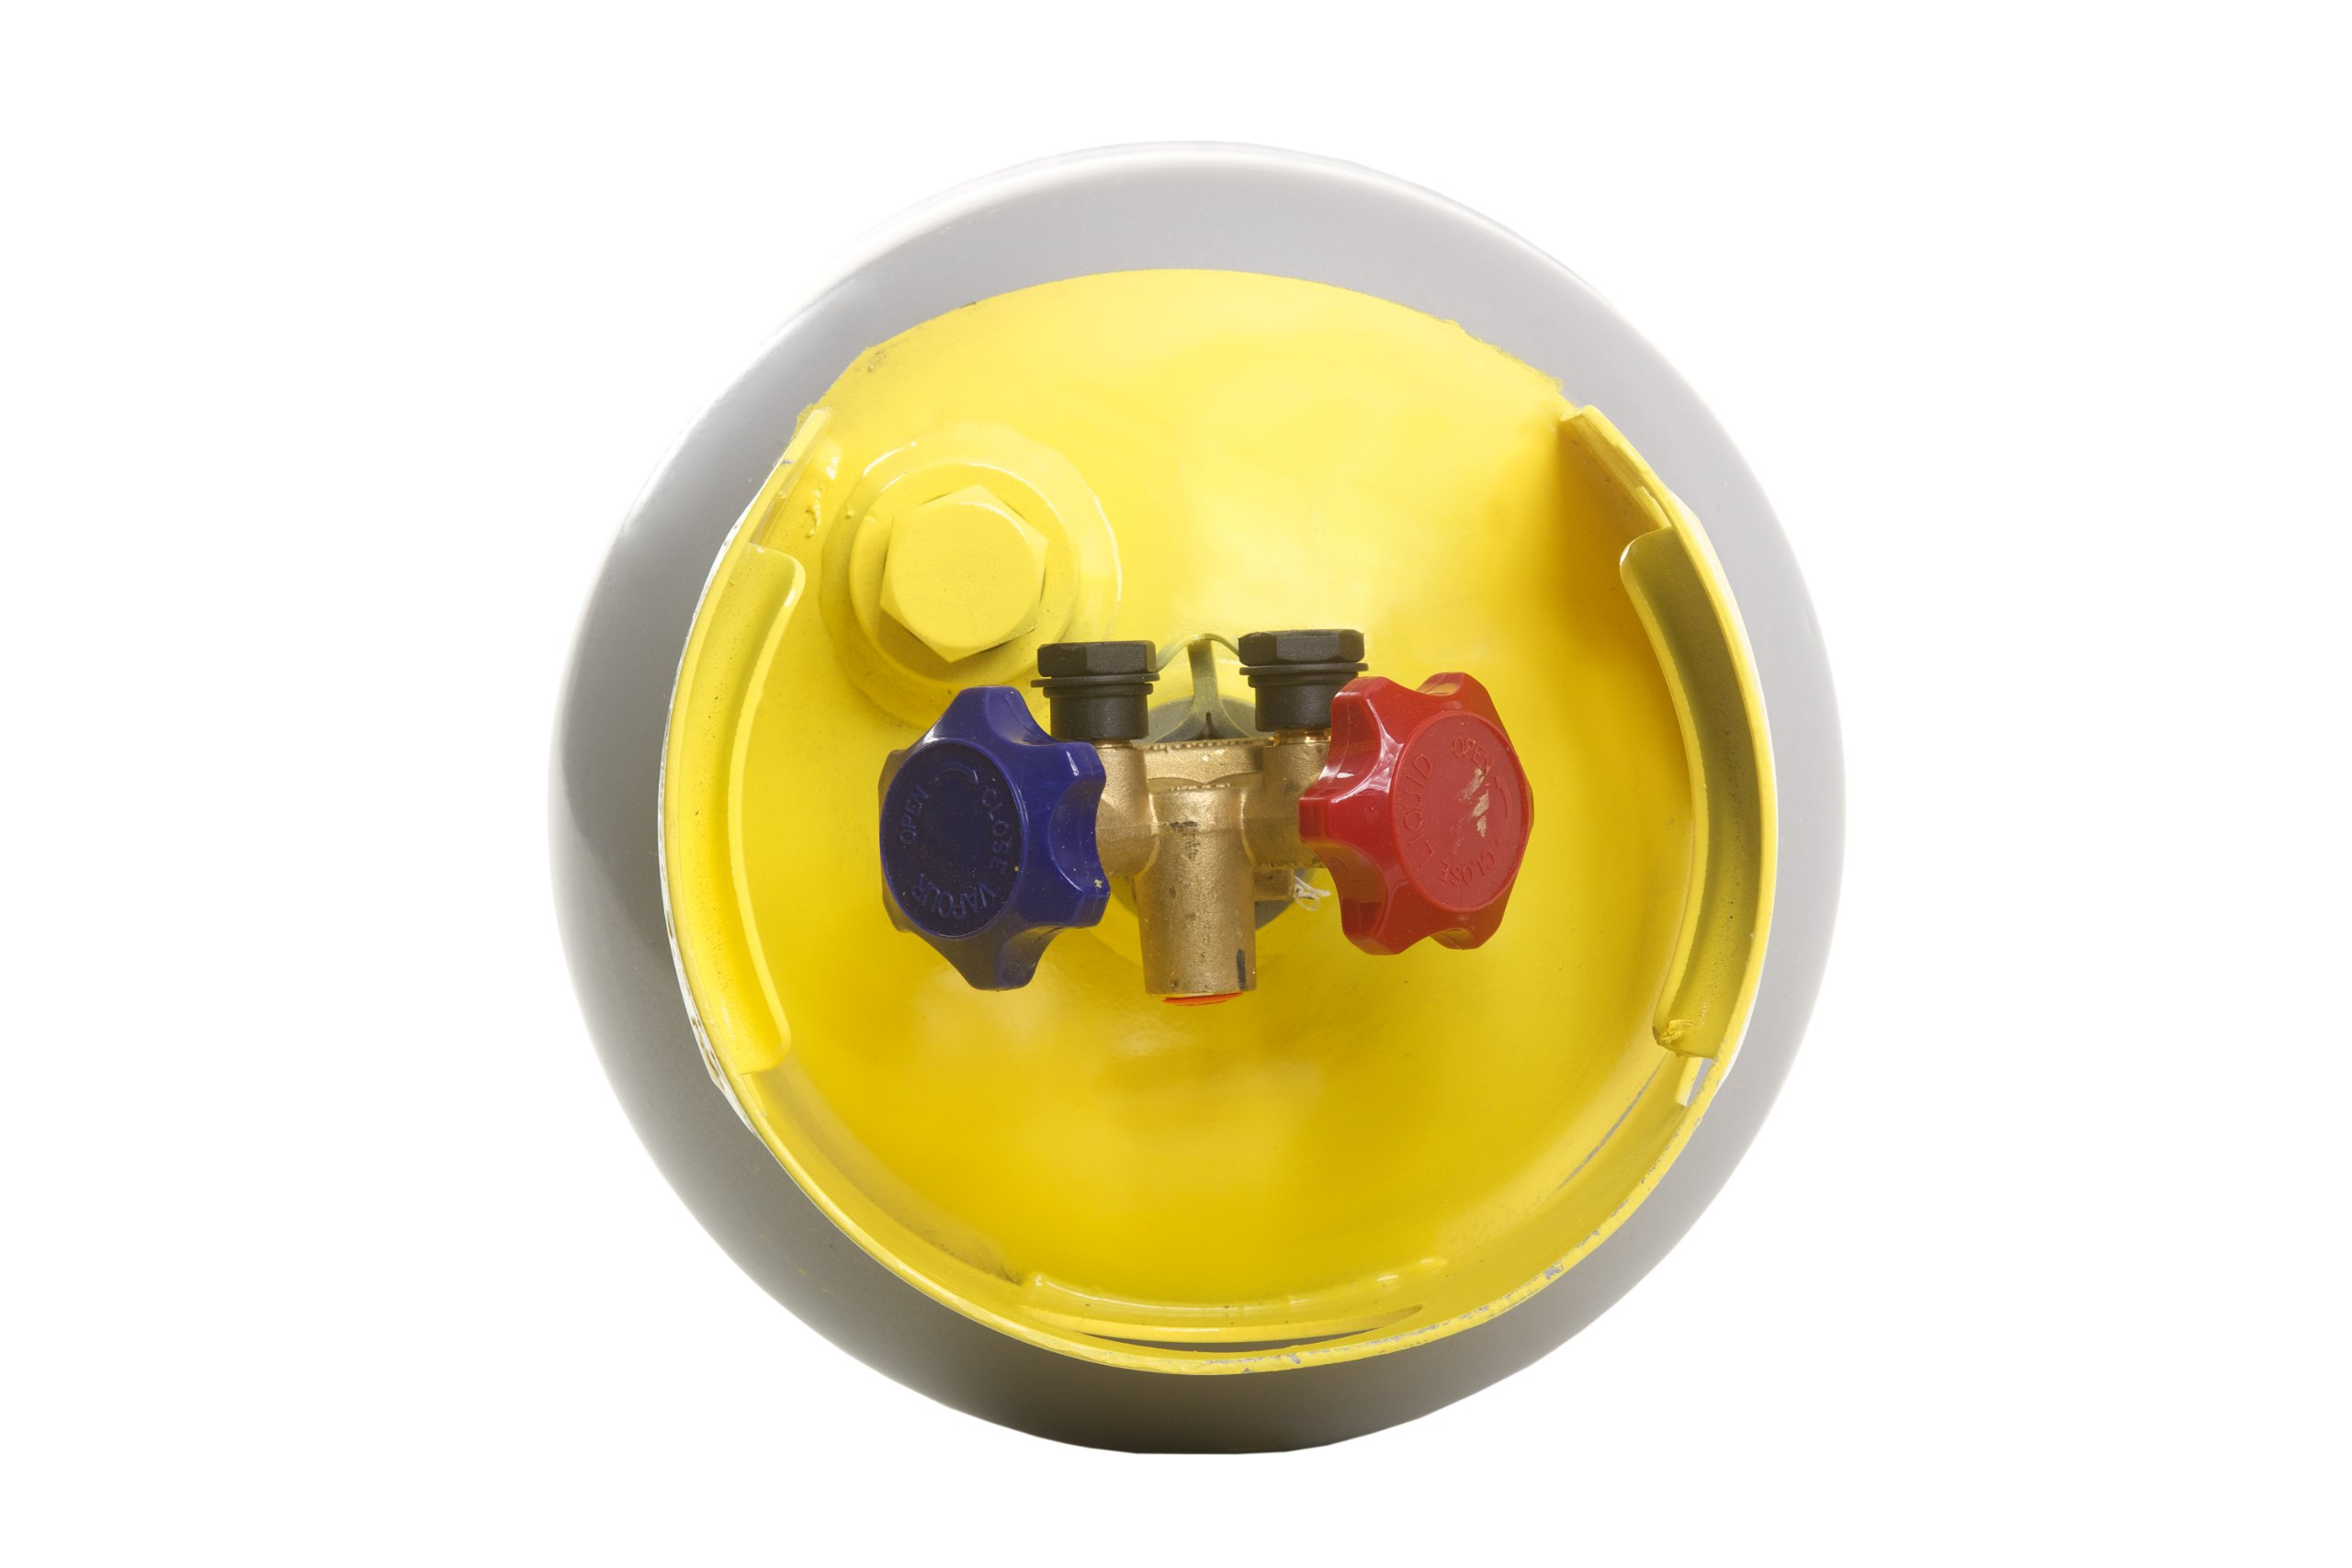 Flame King Refrigerant Recovery Cylinder Tank - Reusable - DOT Compliant - Y-Valve Liquid/Vapor - 30 LB Pound